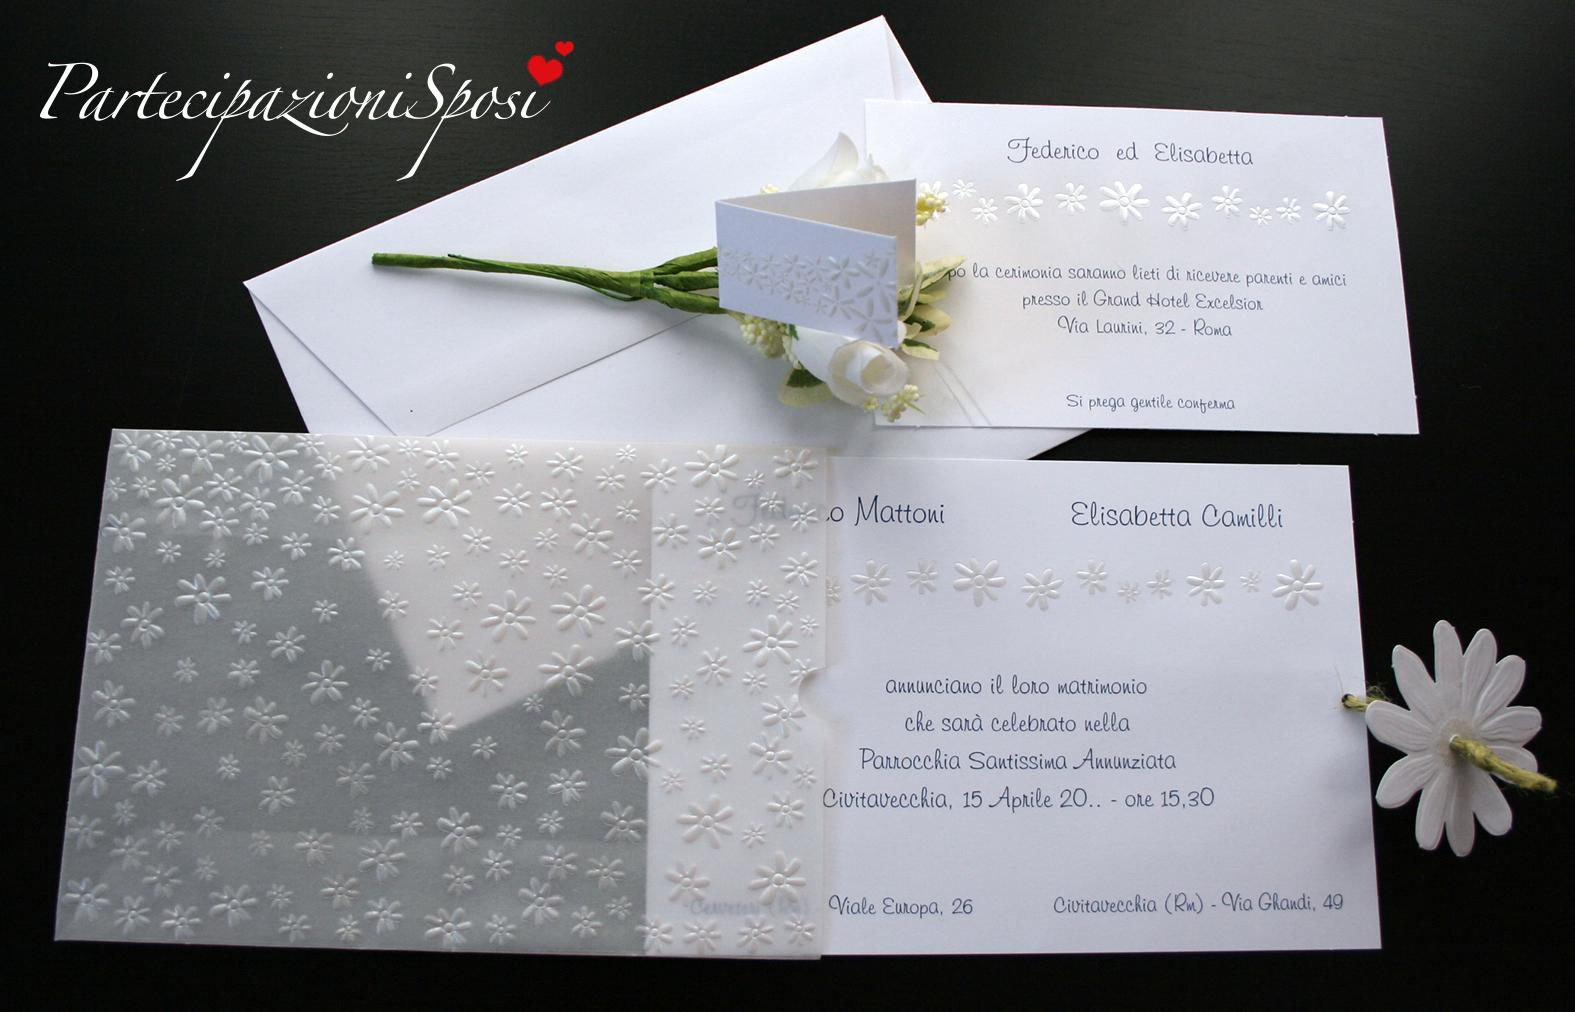 Partecipazioni Matrimonio Hotel.Art 073 Partecipazioni Sposi Stampa Partecipazioni Matrimonio